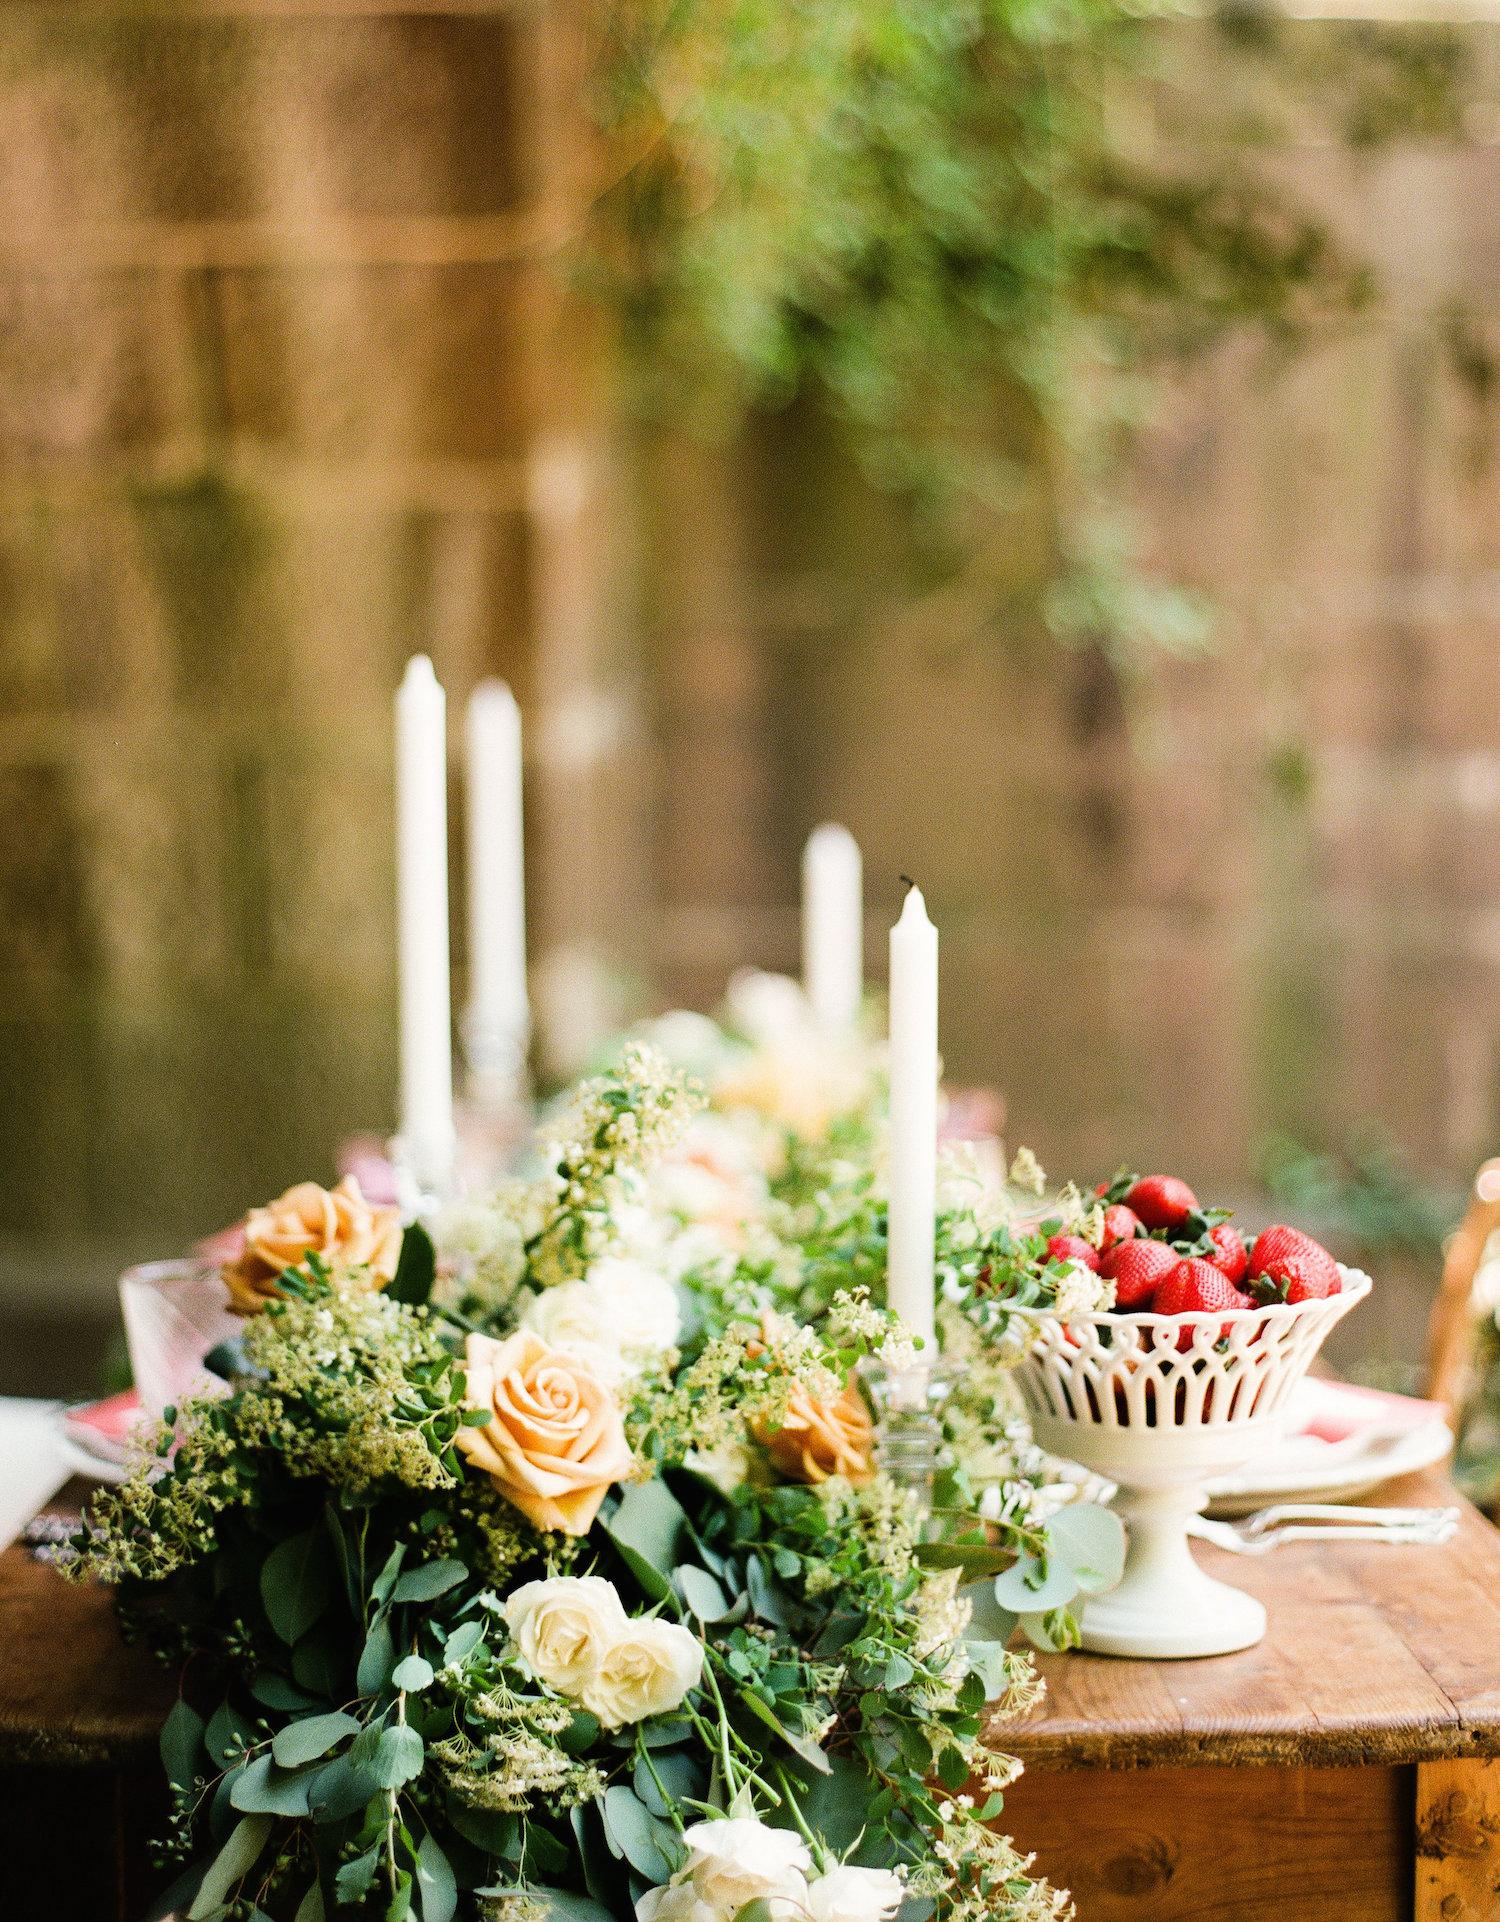 Morning Glow - Full Aperture Floral & Lindsay Madden Photography 78.jpeg